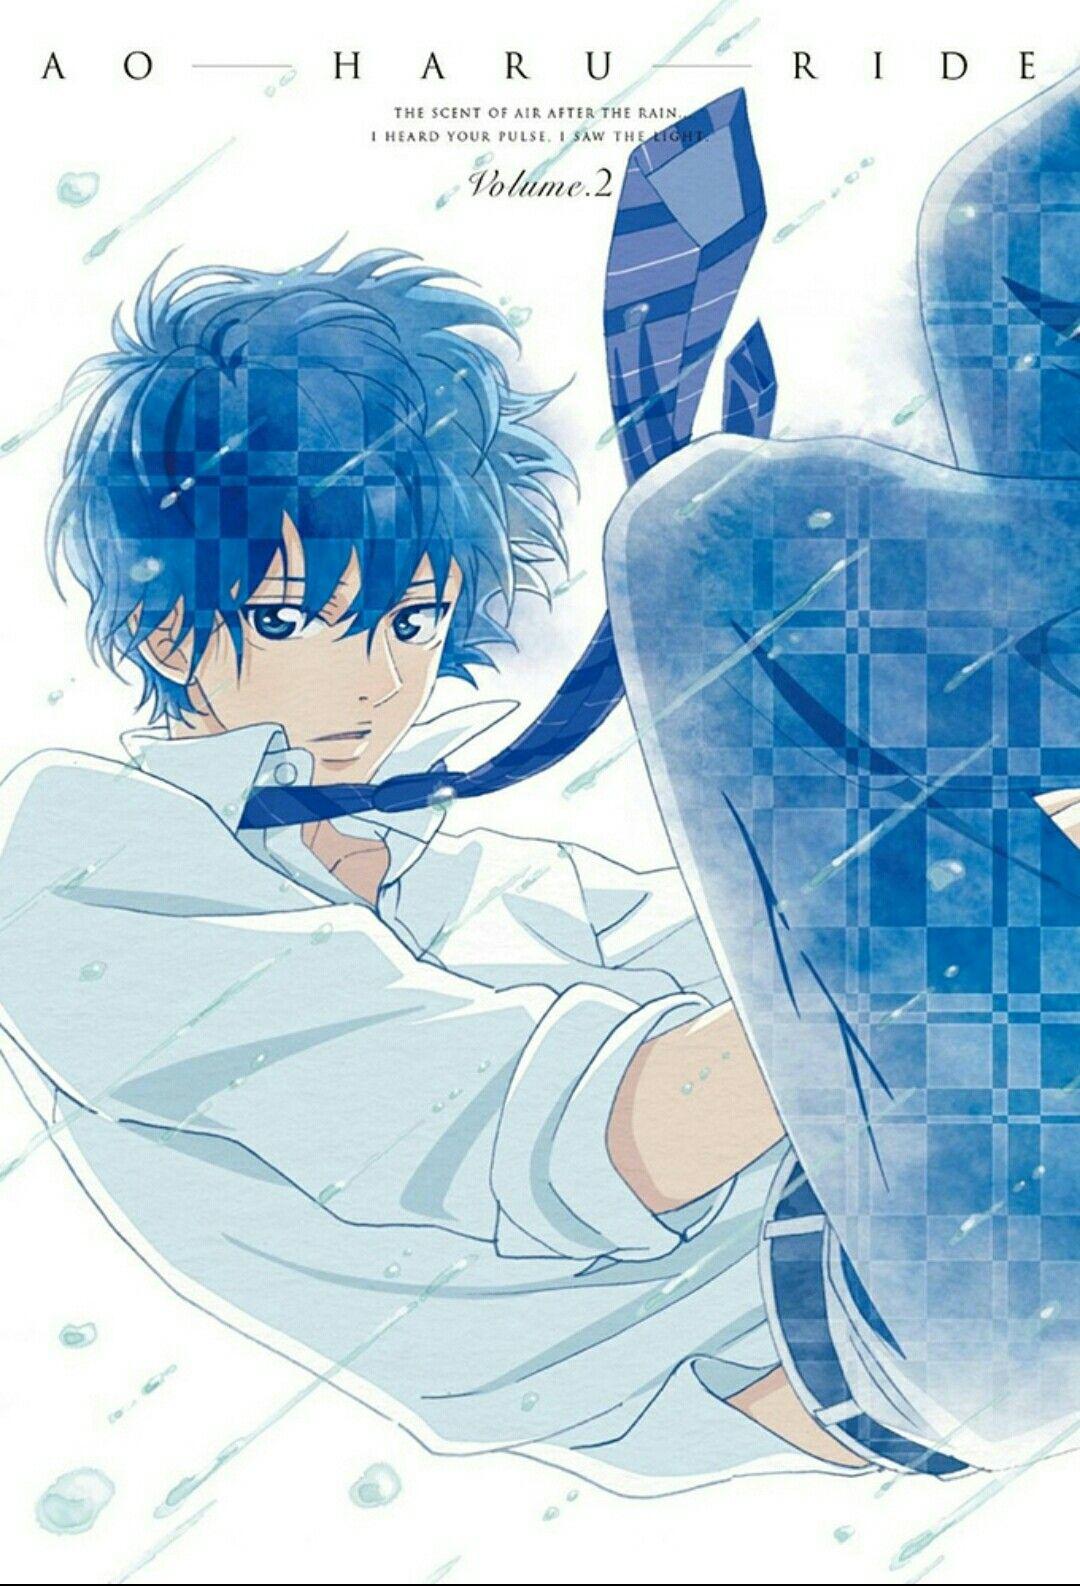 AO HARU RIDE Ao haru ride kou, Blue springs ride, Anime